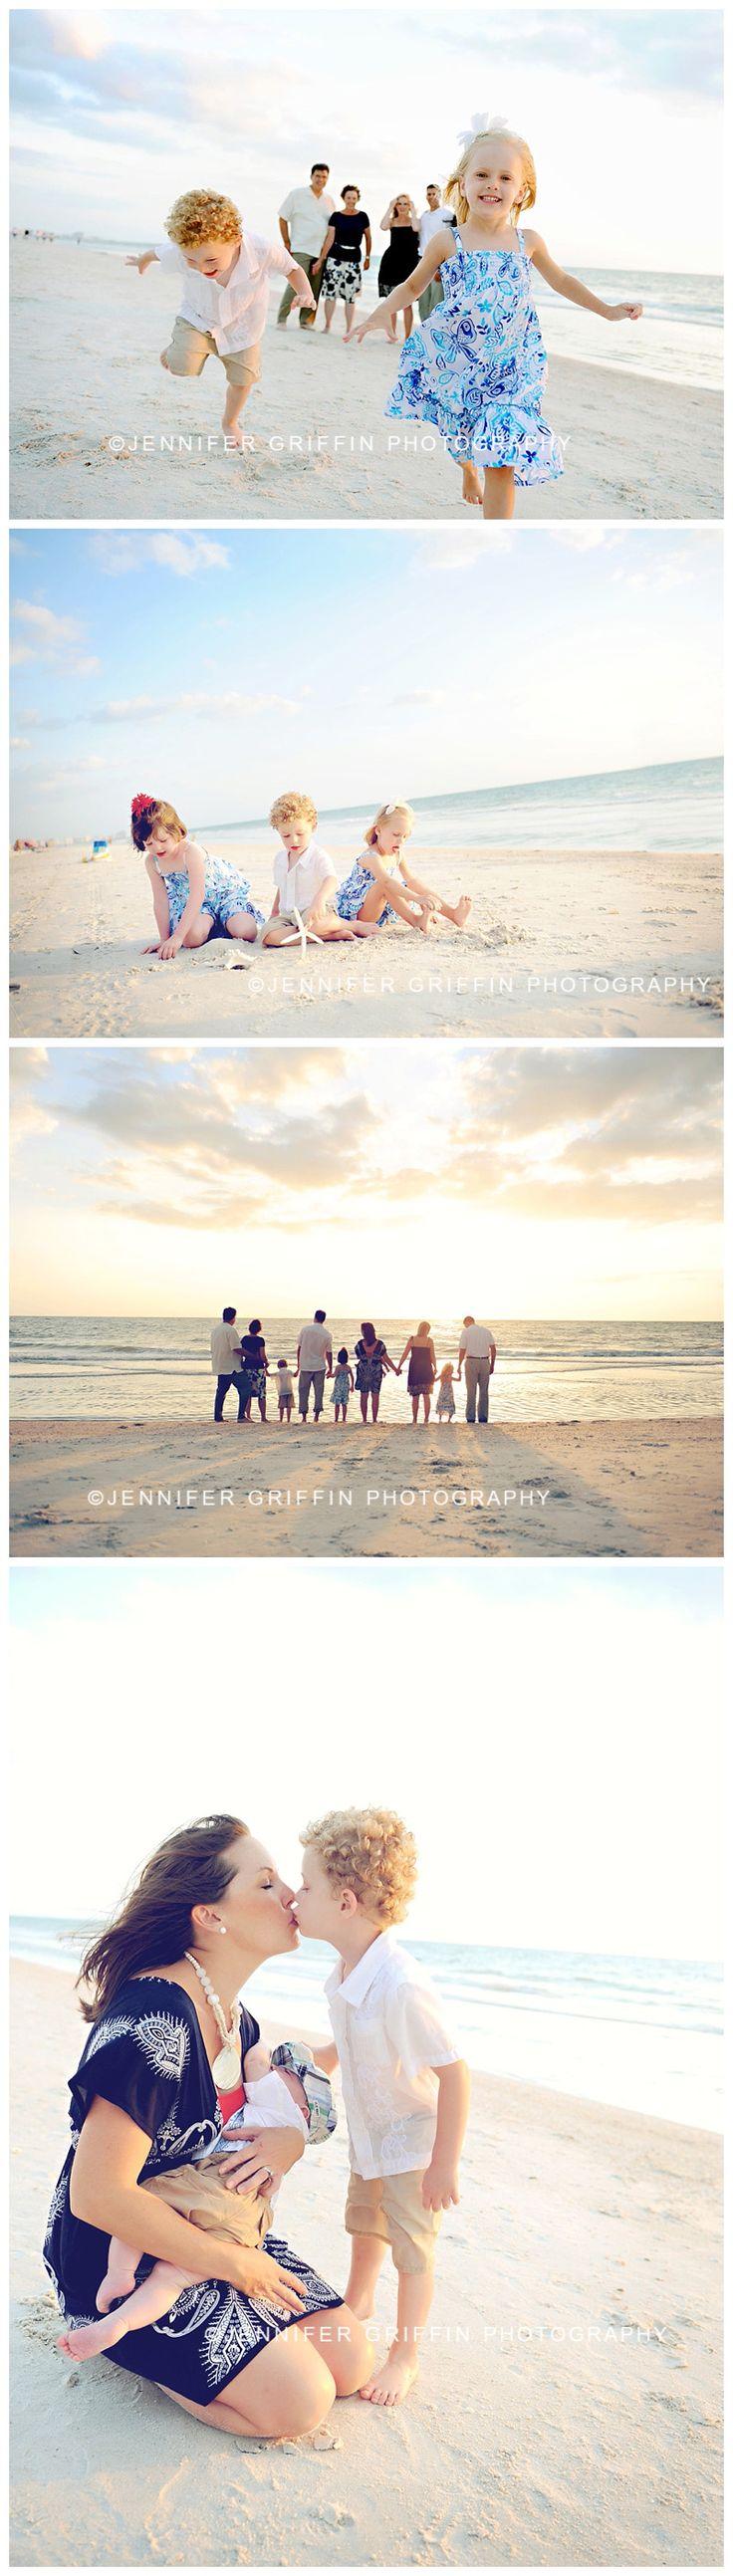 Large Family Beach Photography, Extended Family Beach Portrait Session.  Florida Beach Photographer.  Clearwater, St. Pete Beach.  Anna Maria Island, Holmes Beach, Redington Beach, Treasure Island Florida.  Daytona Beach Photographer.  www.jennifergriffinphotography.com